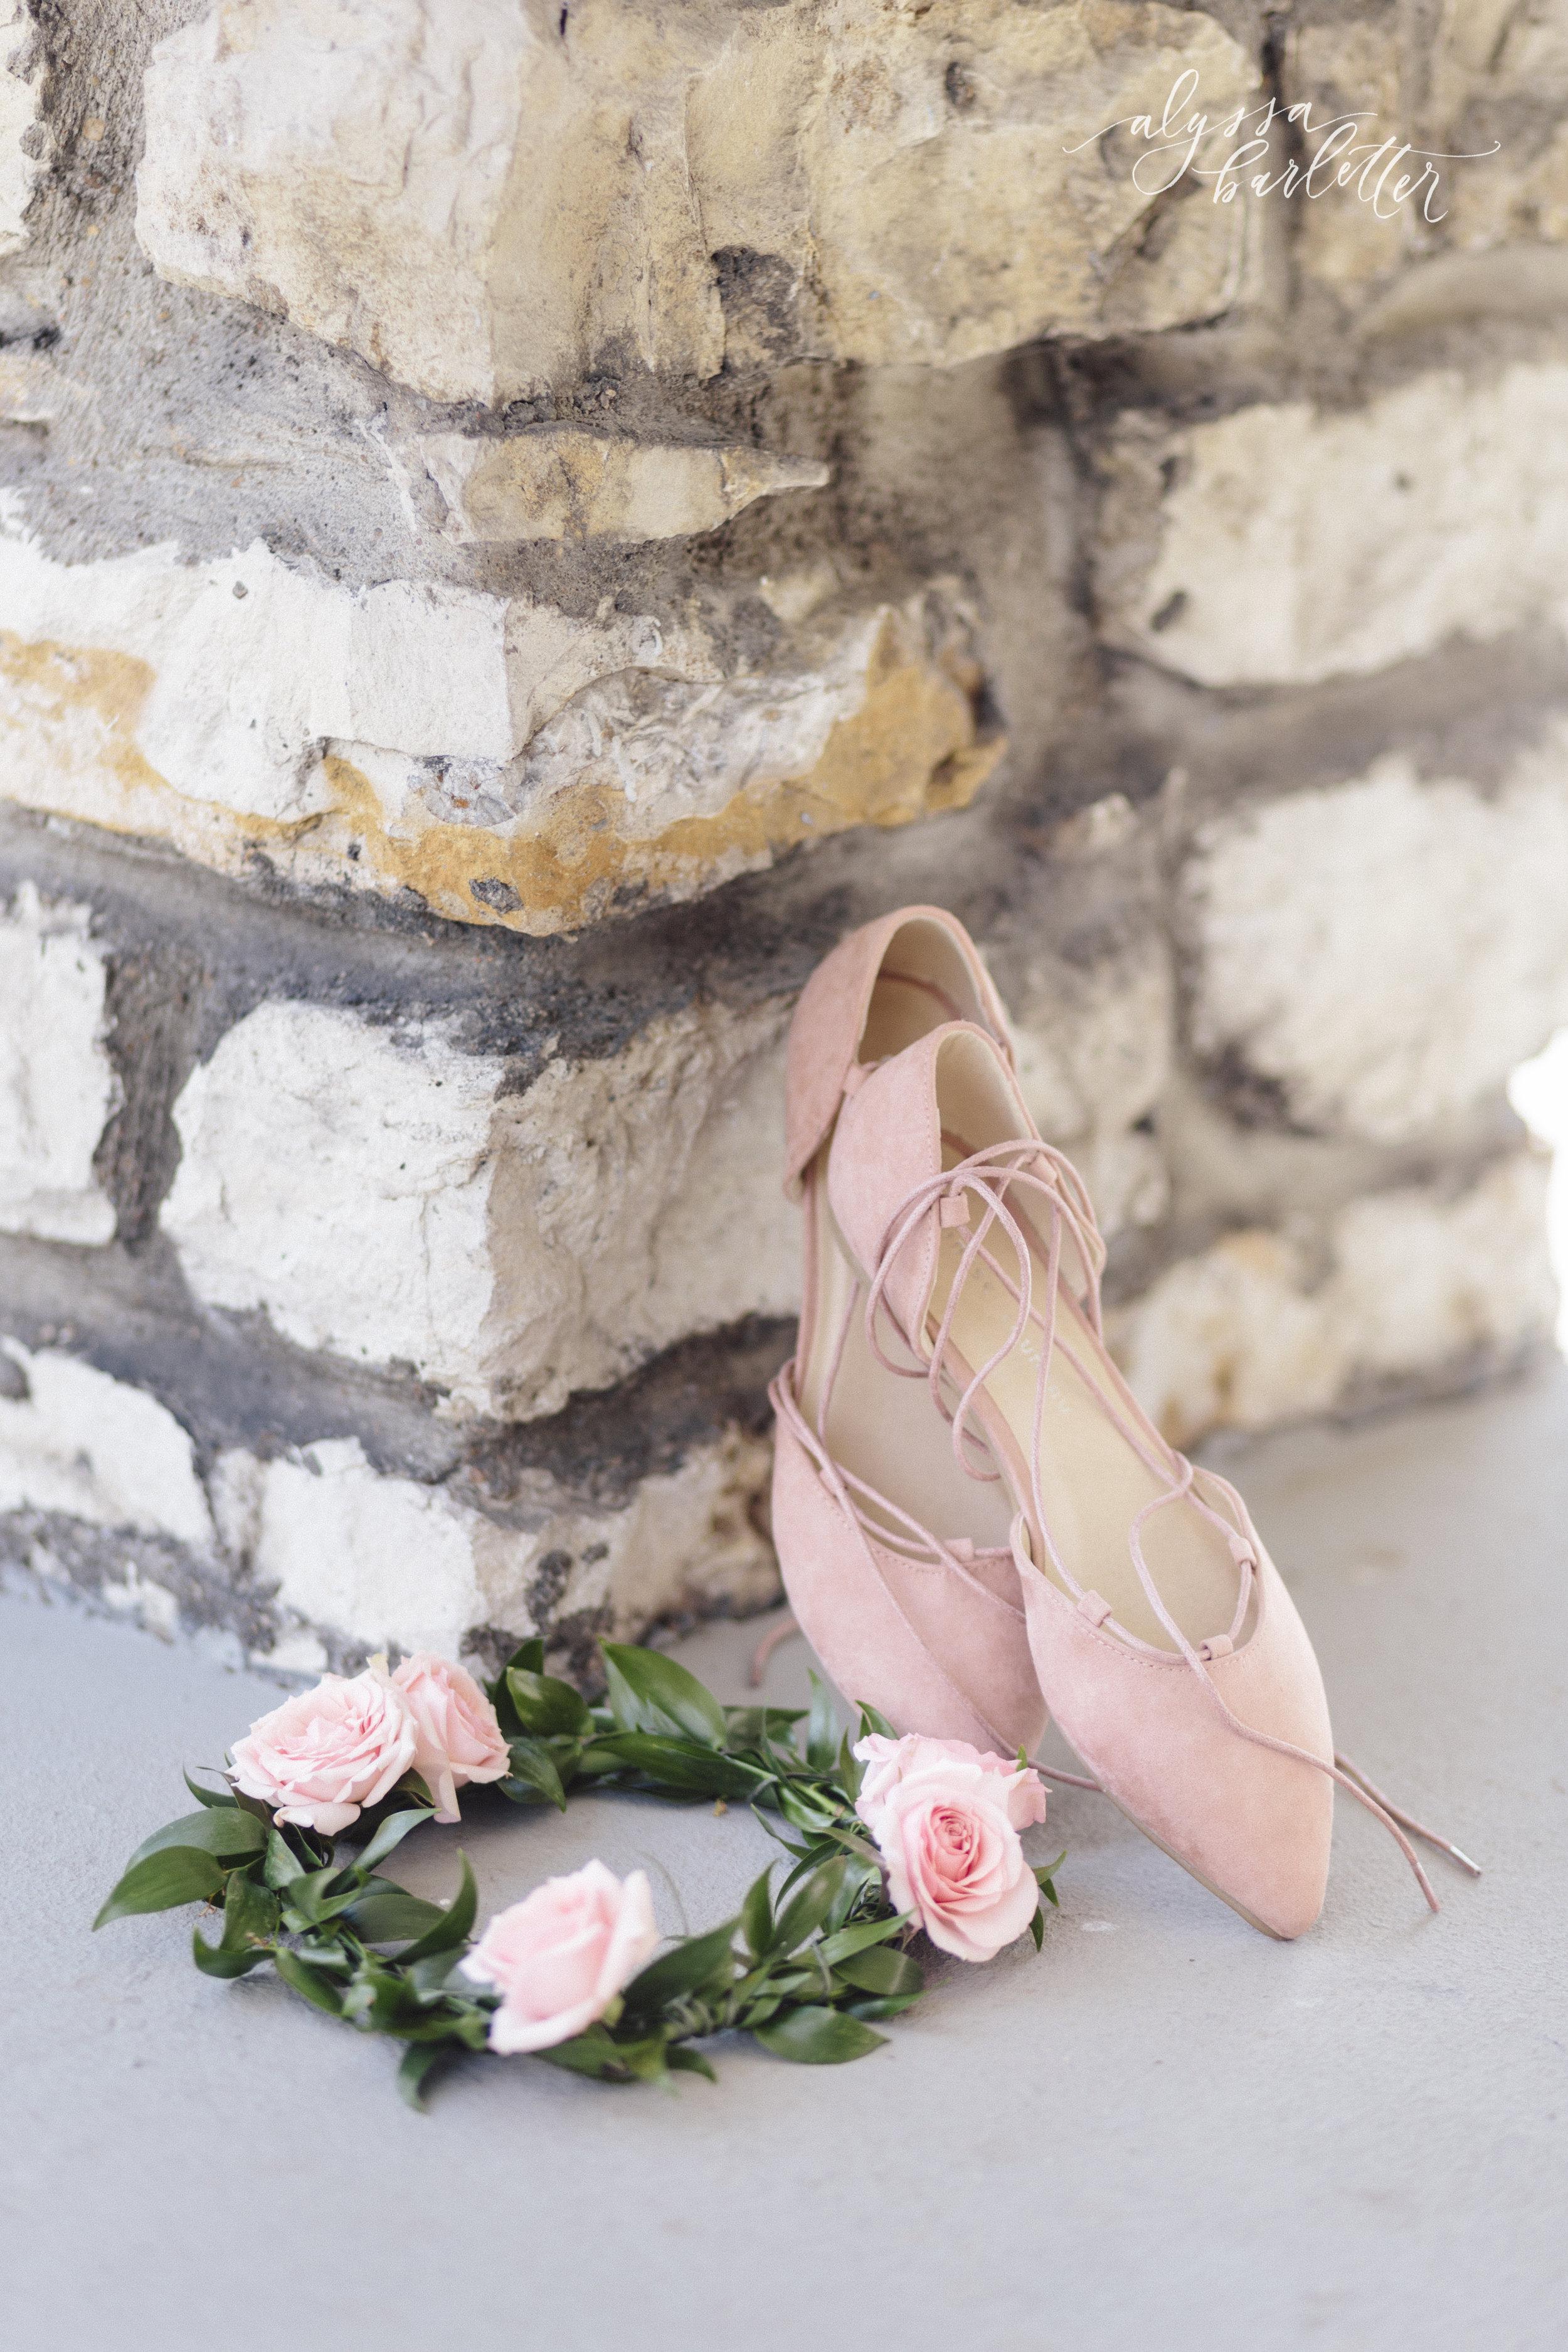 shoes-9230.jpg